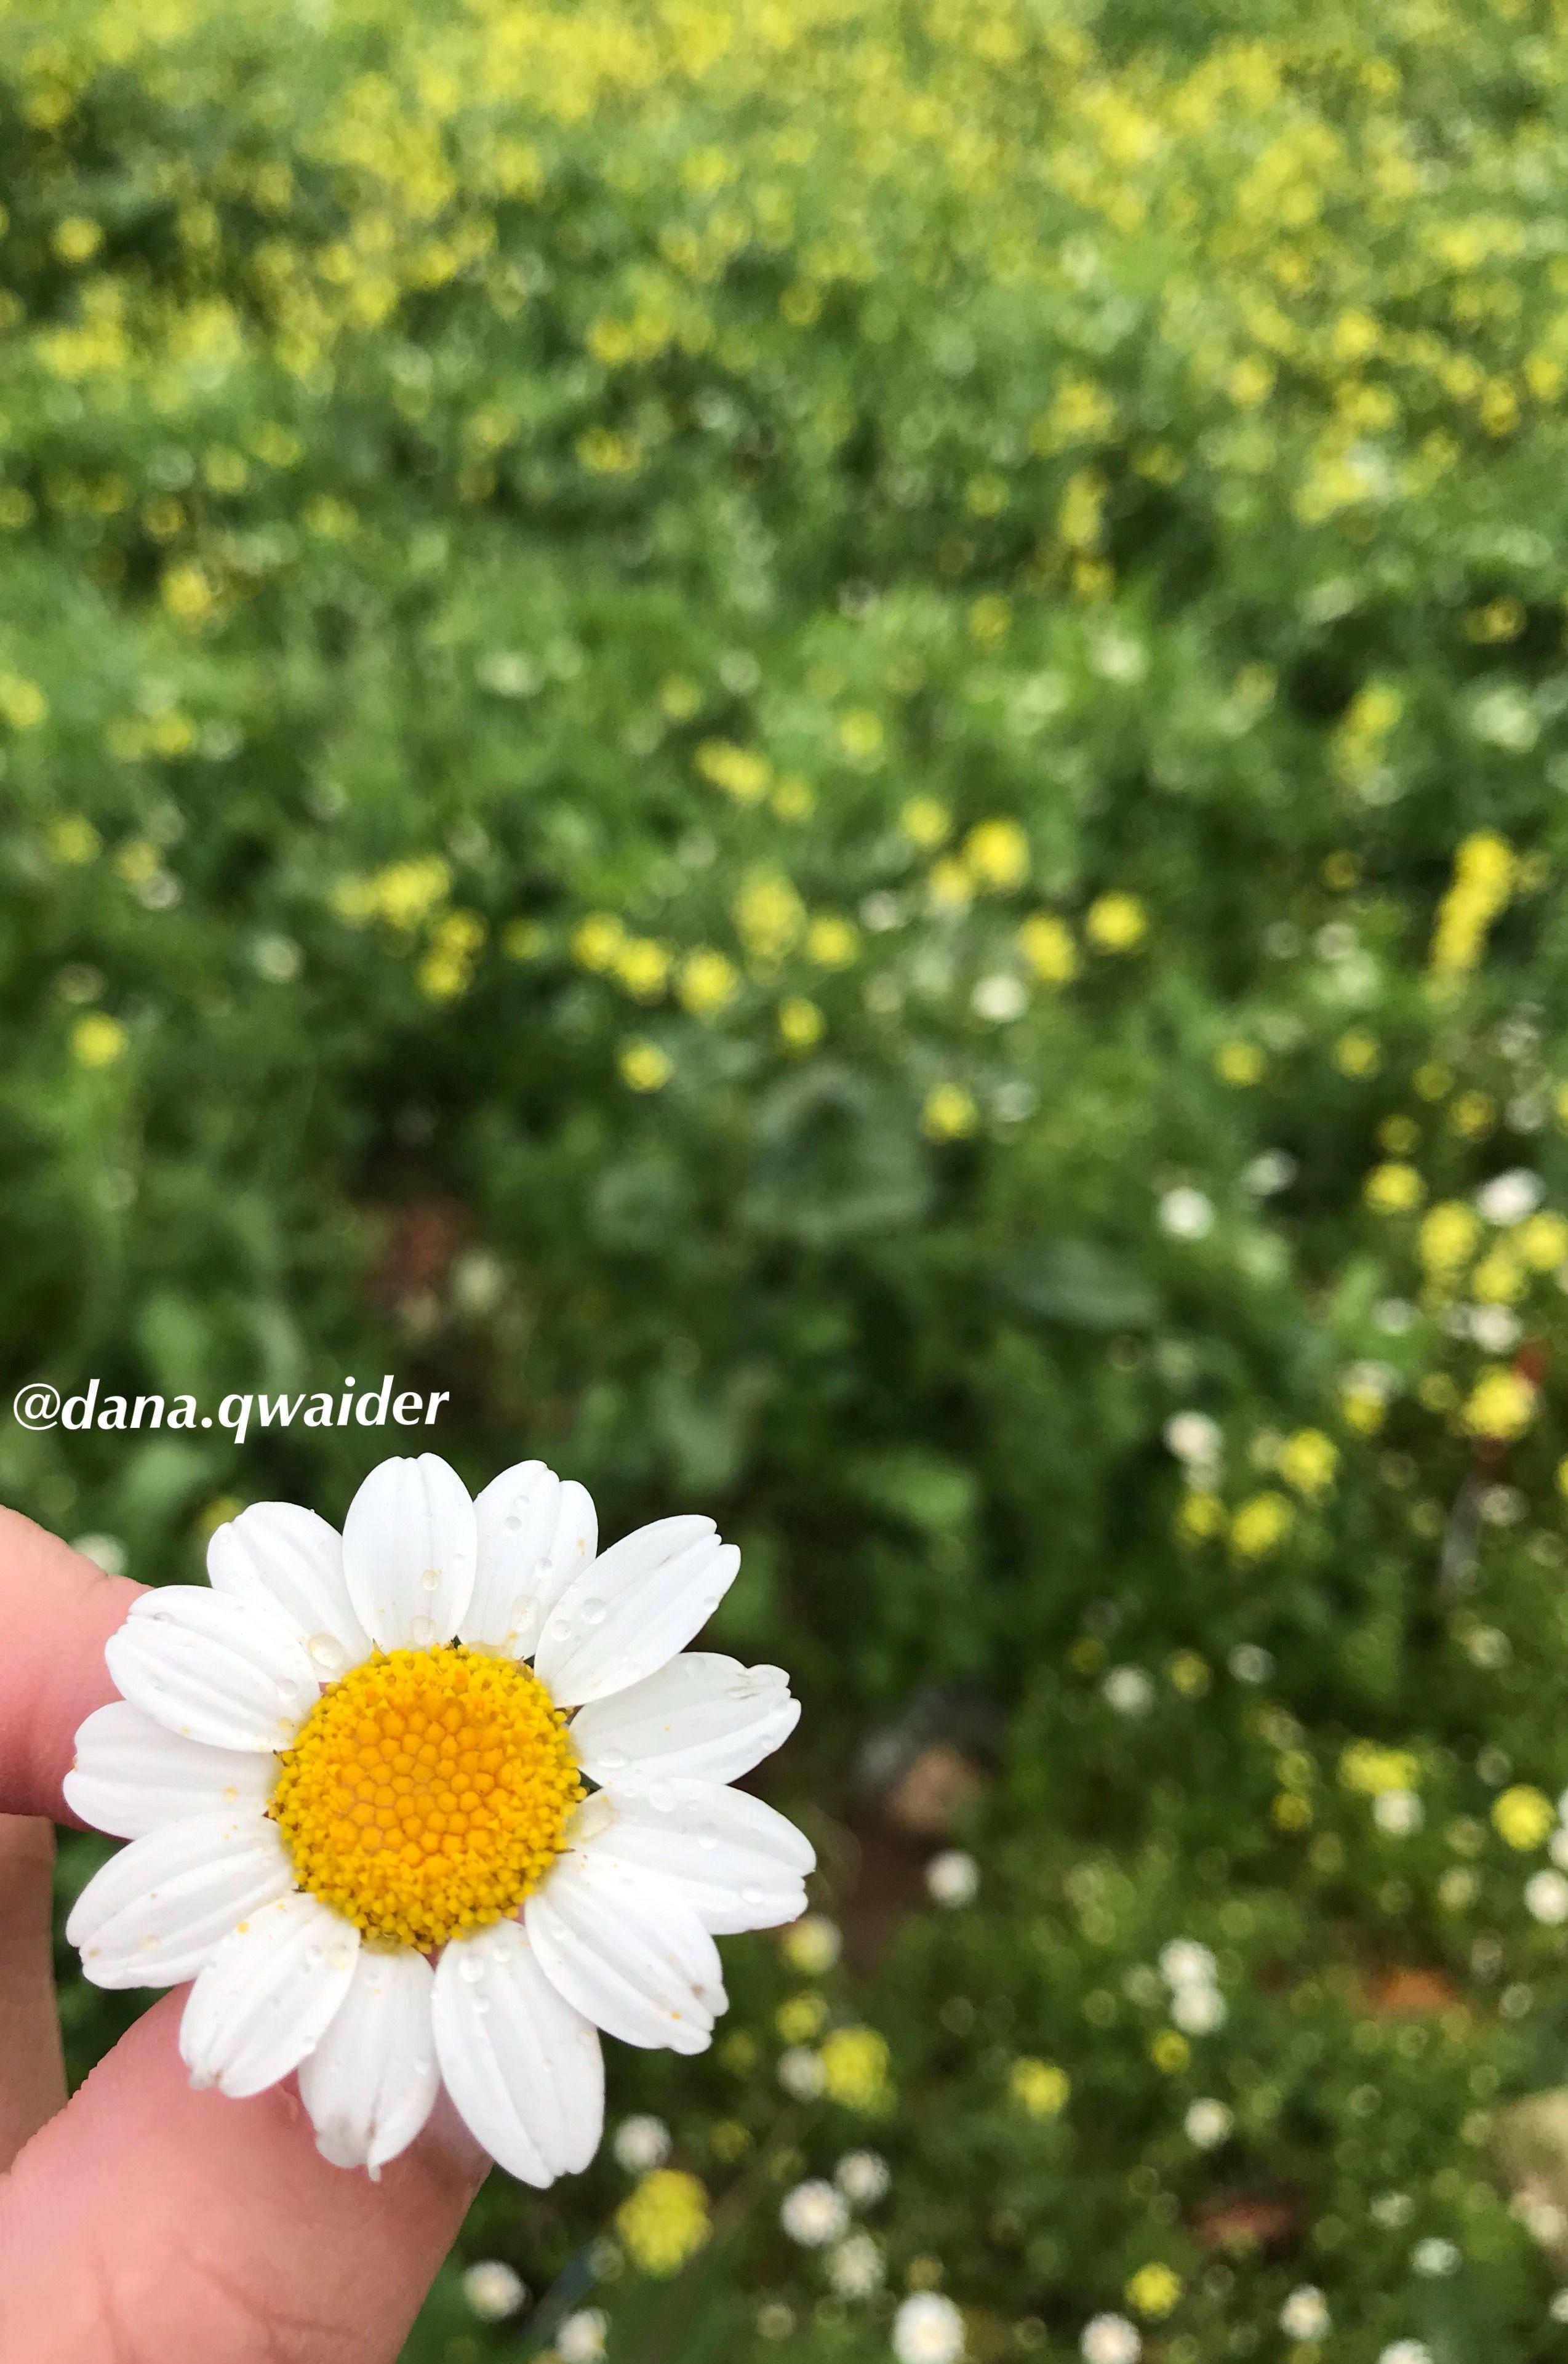 Chamomile Daisy Flower زهرة الأقحوان Daisy Plants Flowers